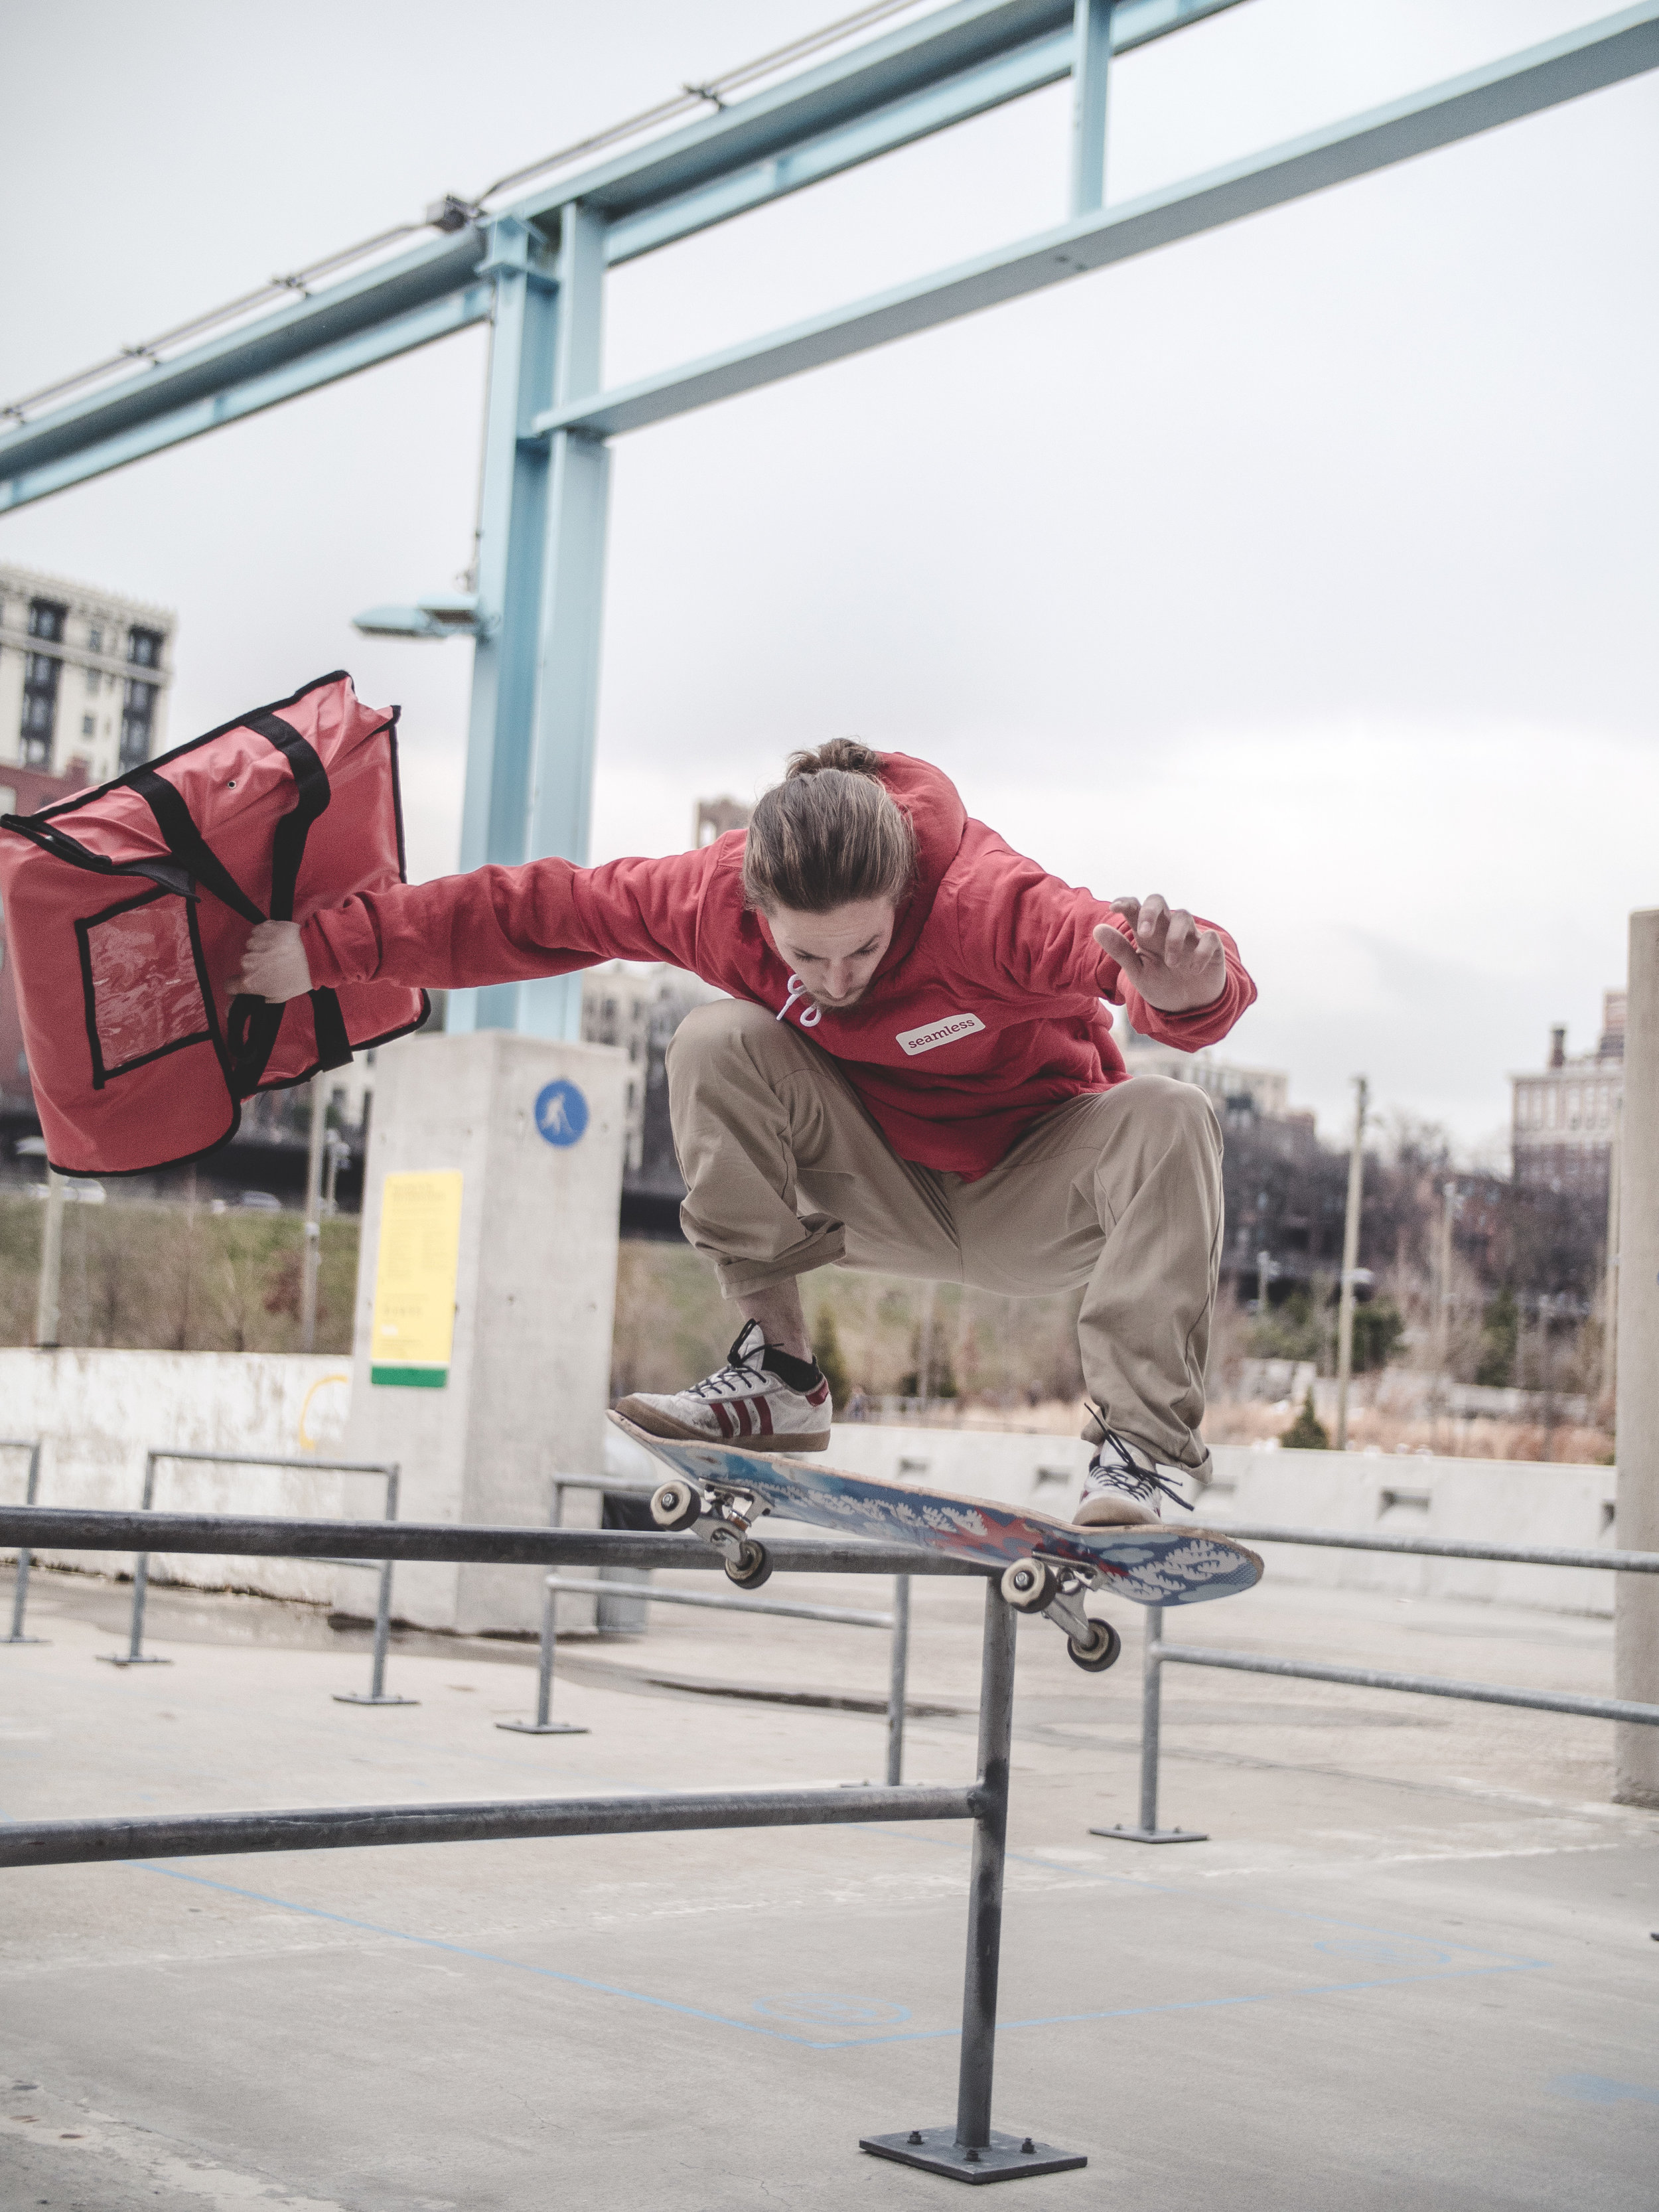 Angelo-Skateboarding-Parkour-Seamless-Grubub-Freeruning-Brooklyn-NY-NYC-New-York-Ollie